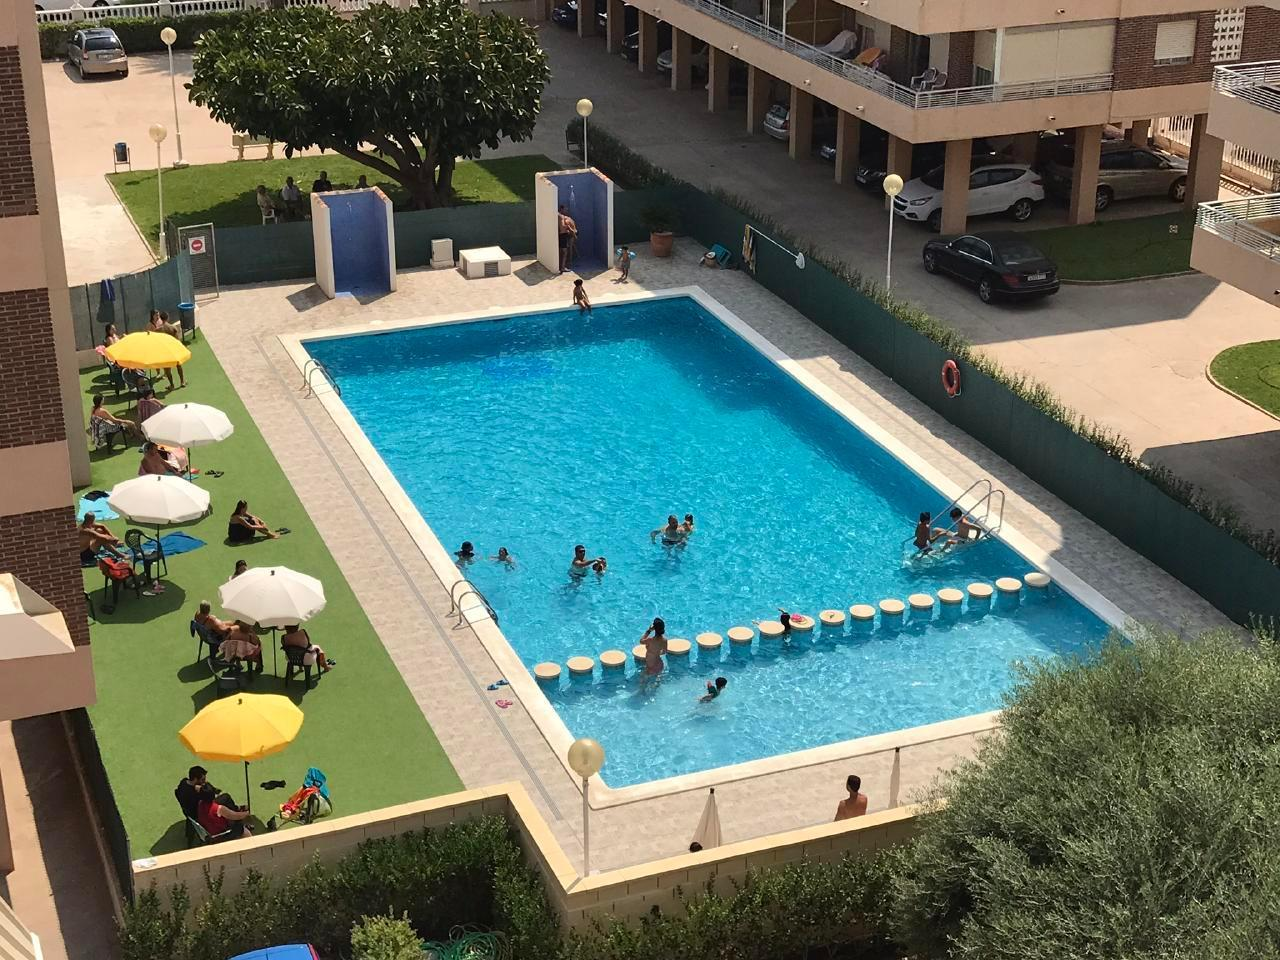 Appartement de vacances Sonnige 3.5 Zi-Wohnung am Meer (1026876), Torrevieja, Costa Blanca, Valence, Espagne, image 22